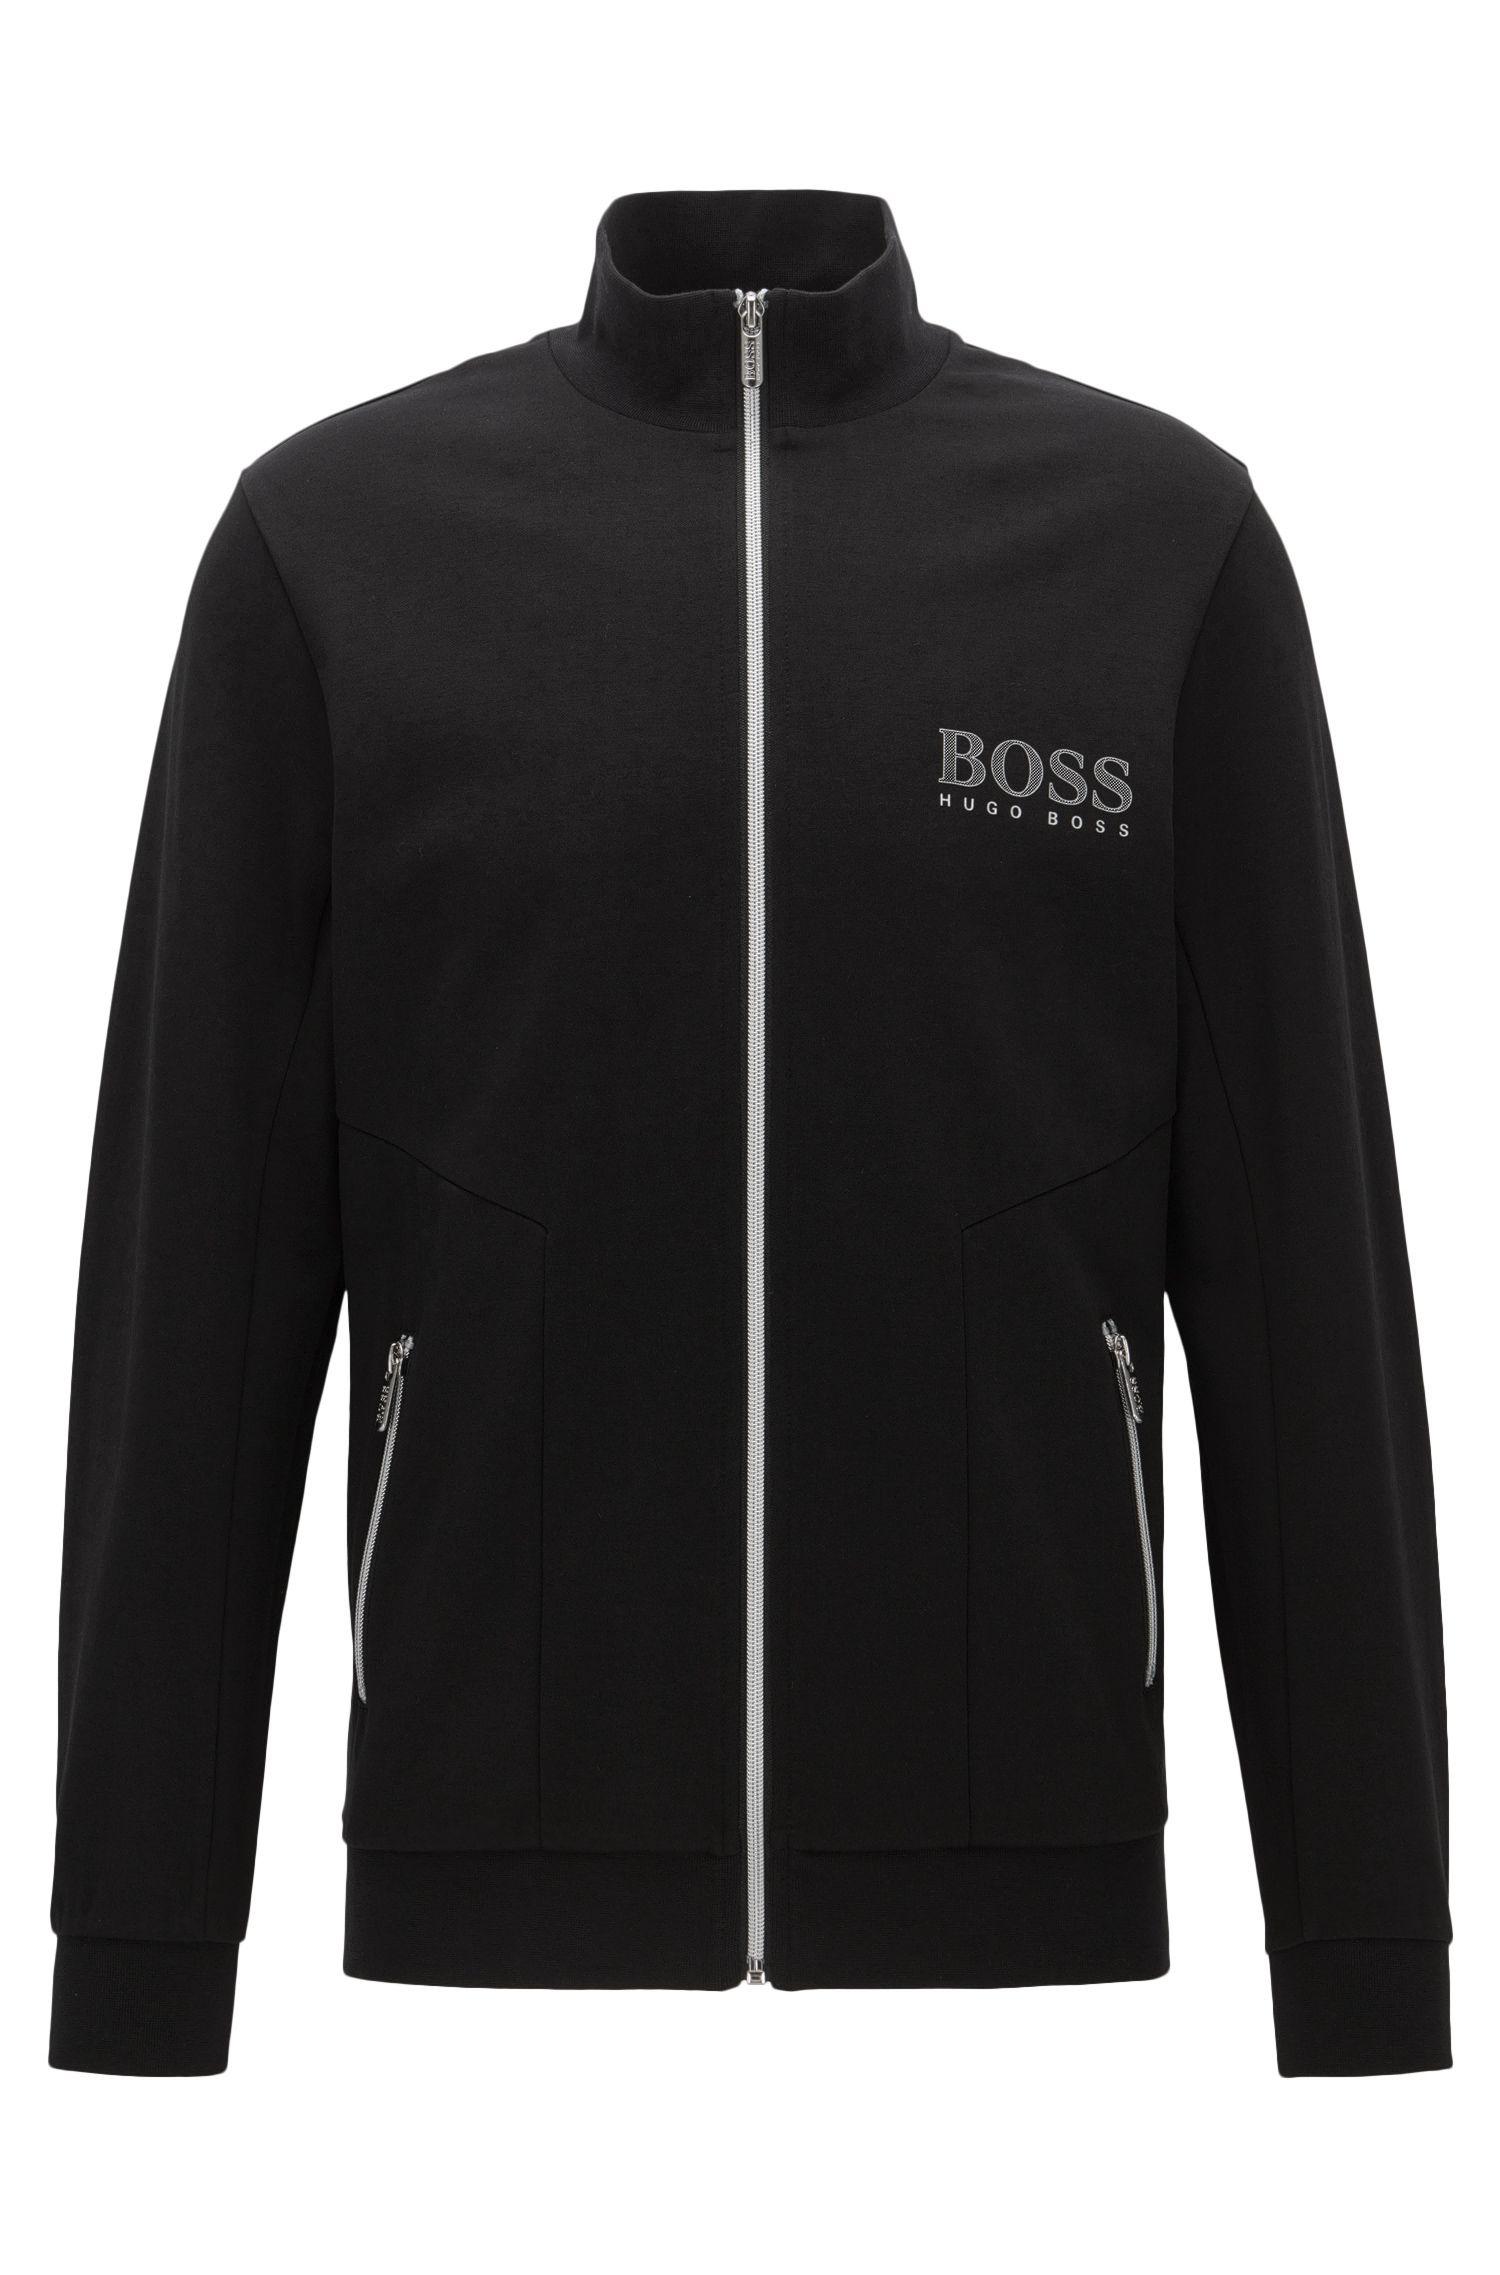 Stretch Cotton Jersey Full-Zip Jacket | Tracksuit Jacket